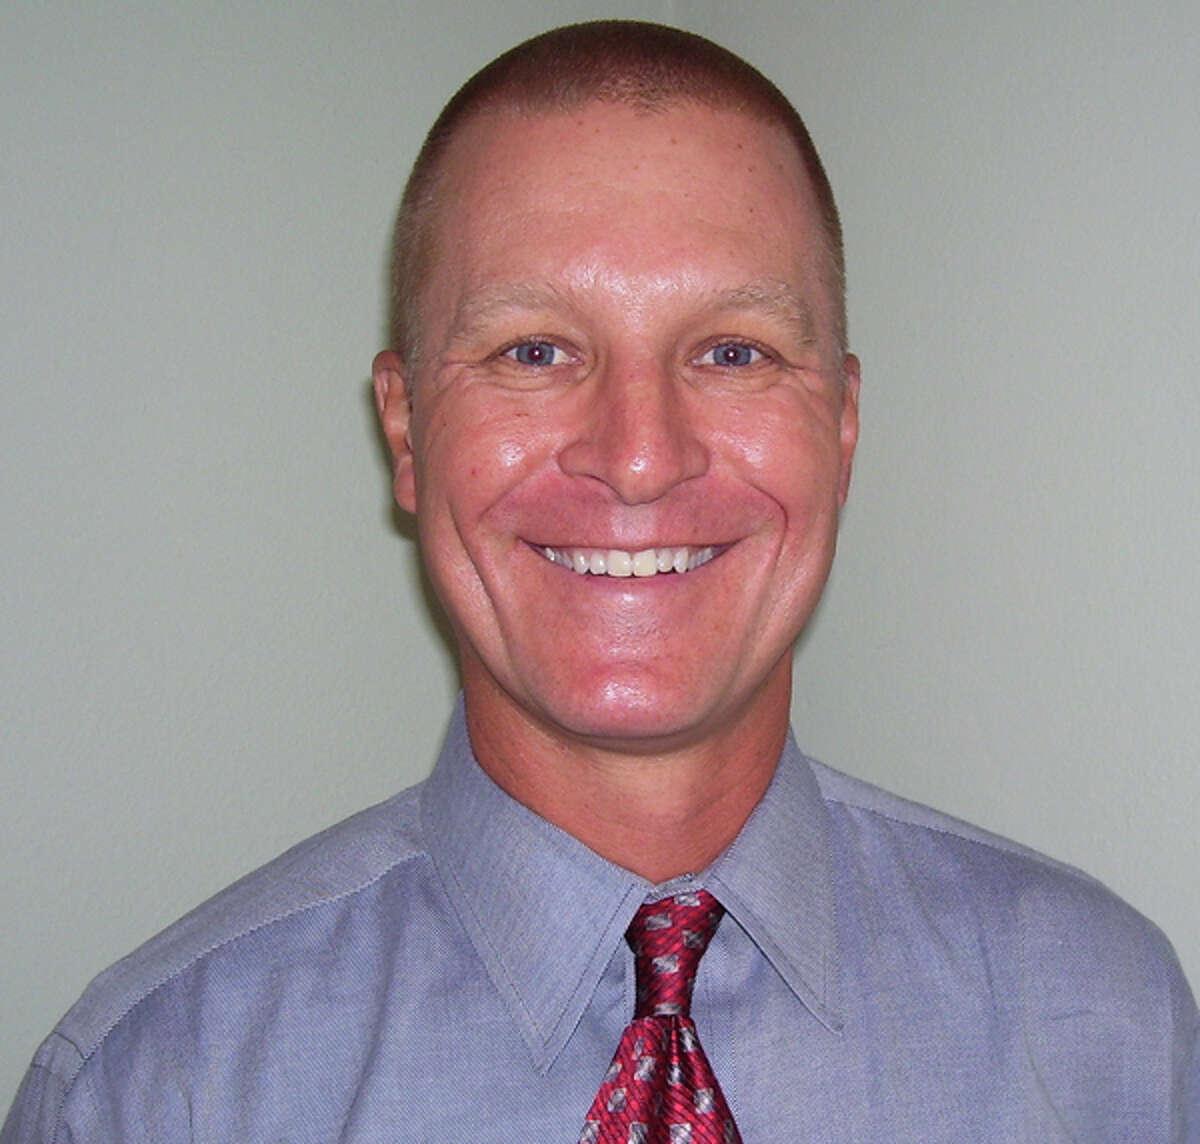 St. Thomas High School athletic director Mike Netzel